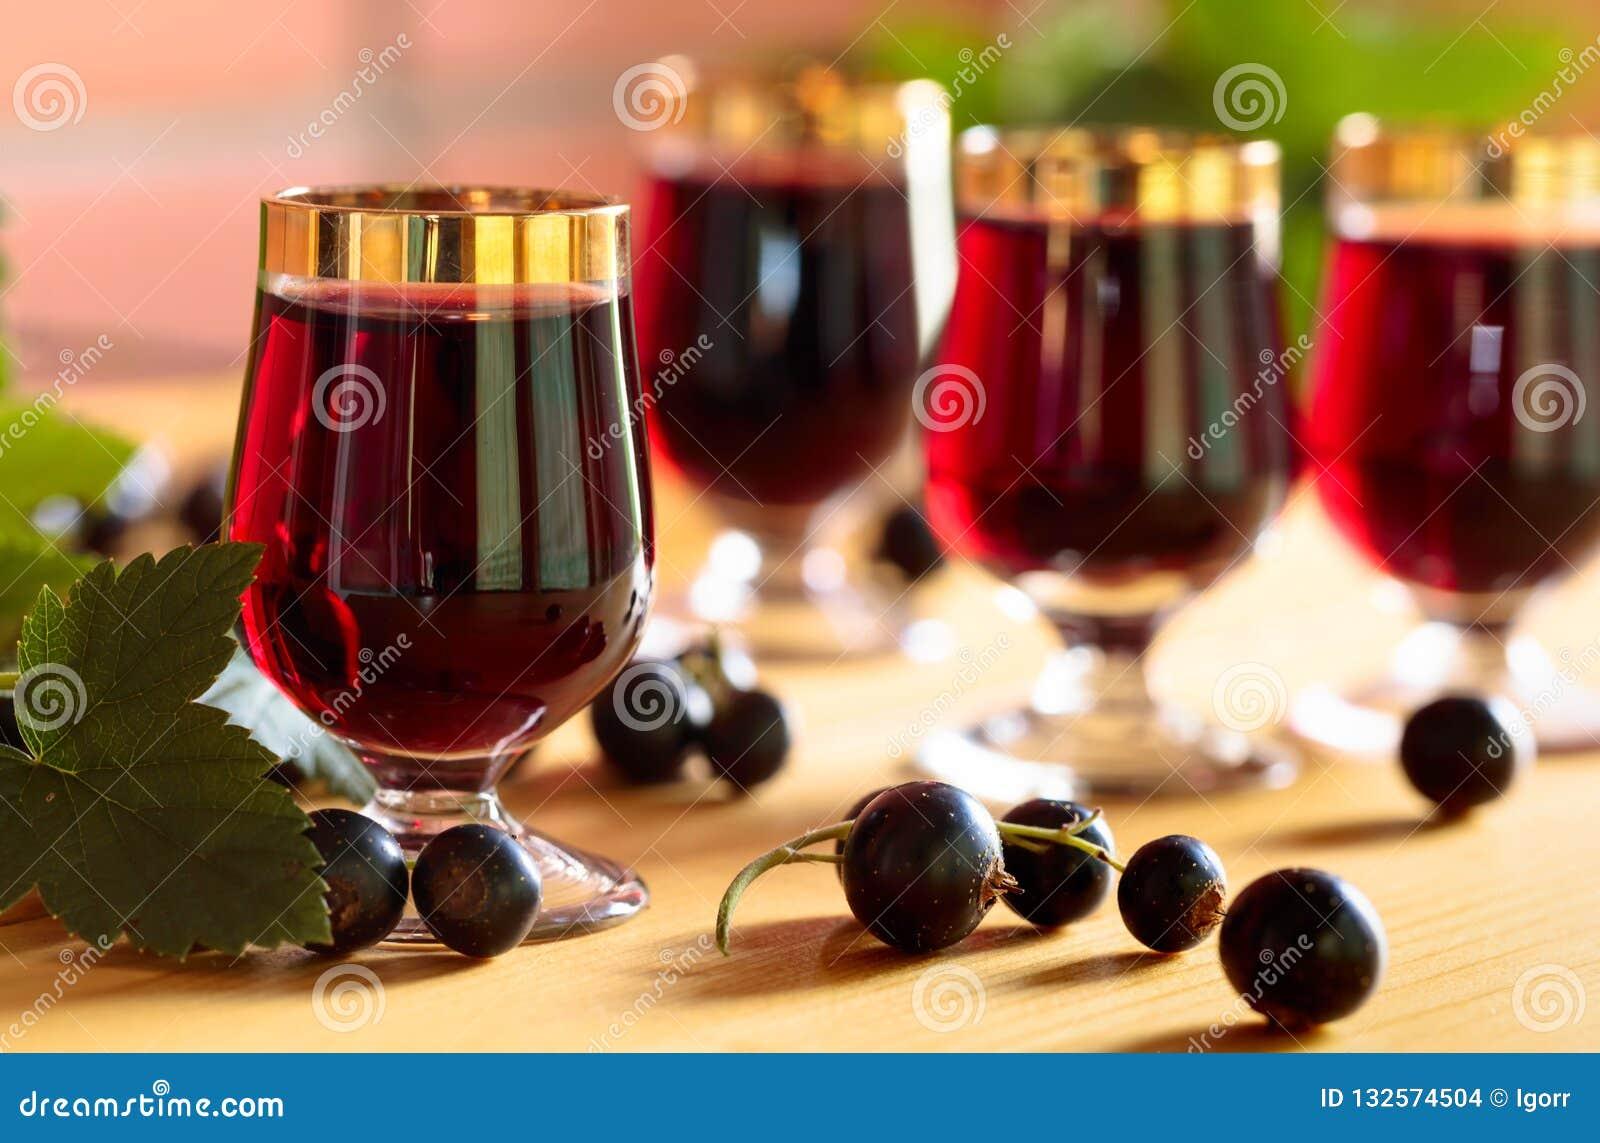 Homemade black currant liqueur and fresh berries